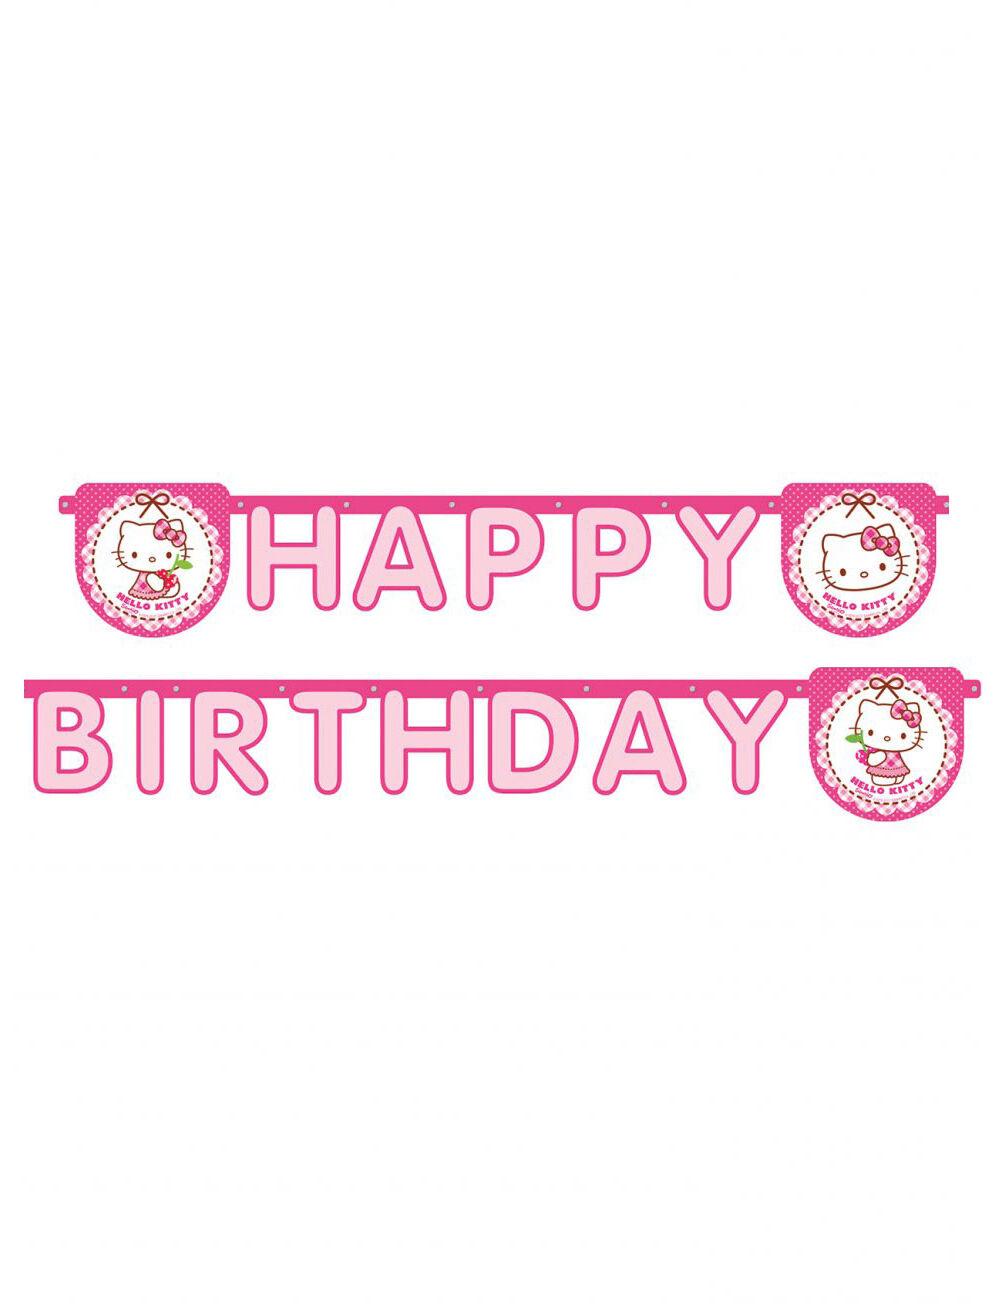 Deguisetoi 1 Guirlande Happy Birthday Hello Kitty 2 m